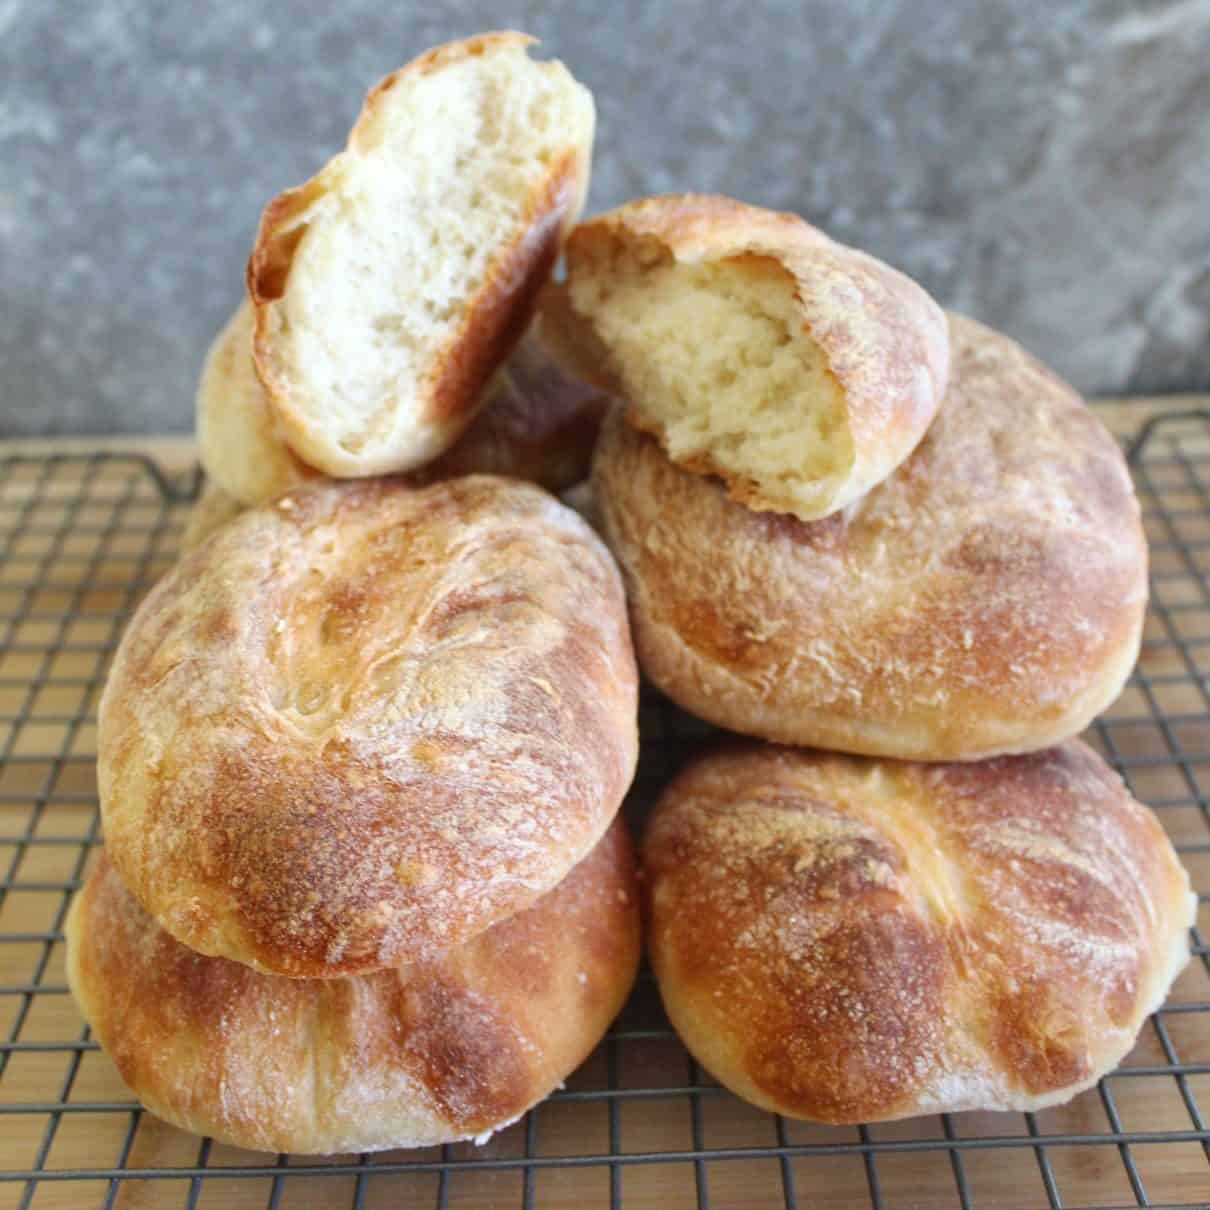 Easy Homemade Bread (5 Ingredients) - Mediterranean Latin Love Affair